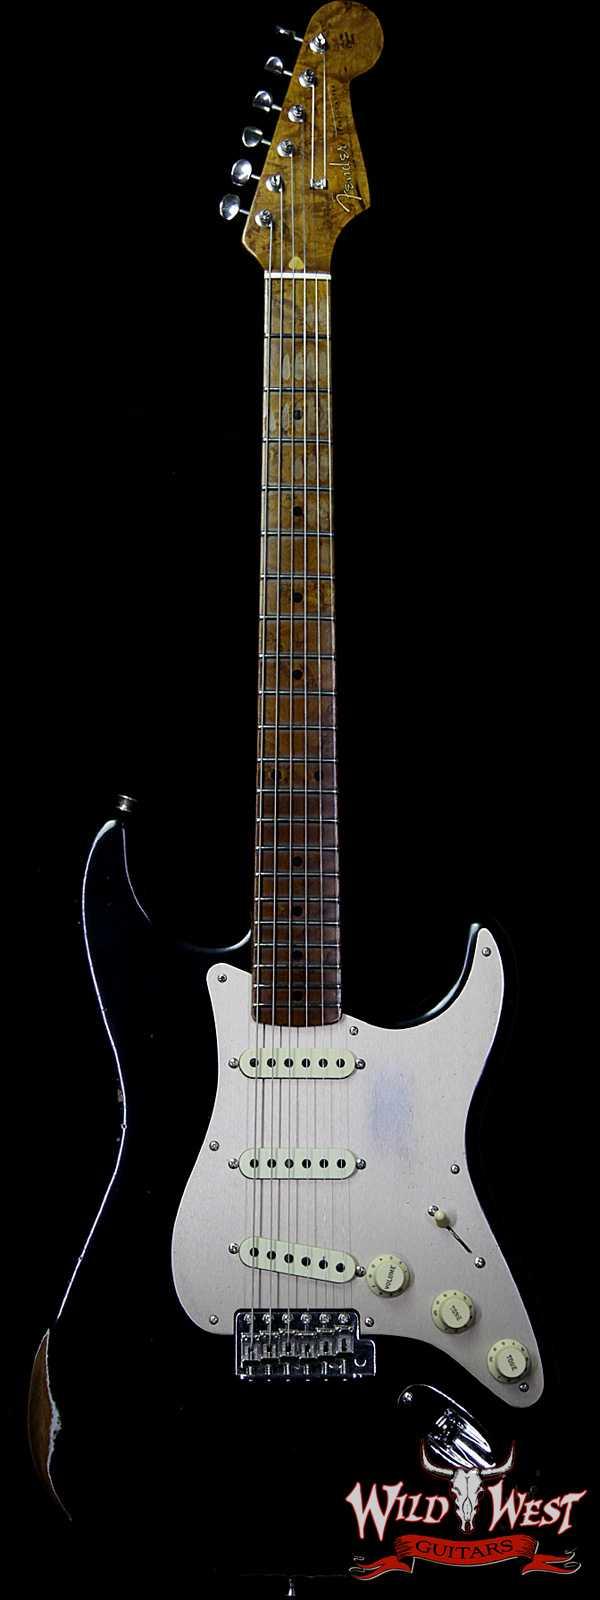 Fender Custom Shop 1956 Roasted Stratocaster Relic Birdseye Neck & Fingerboard Aged Black